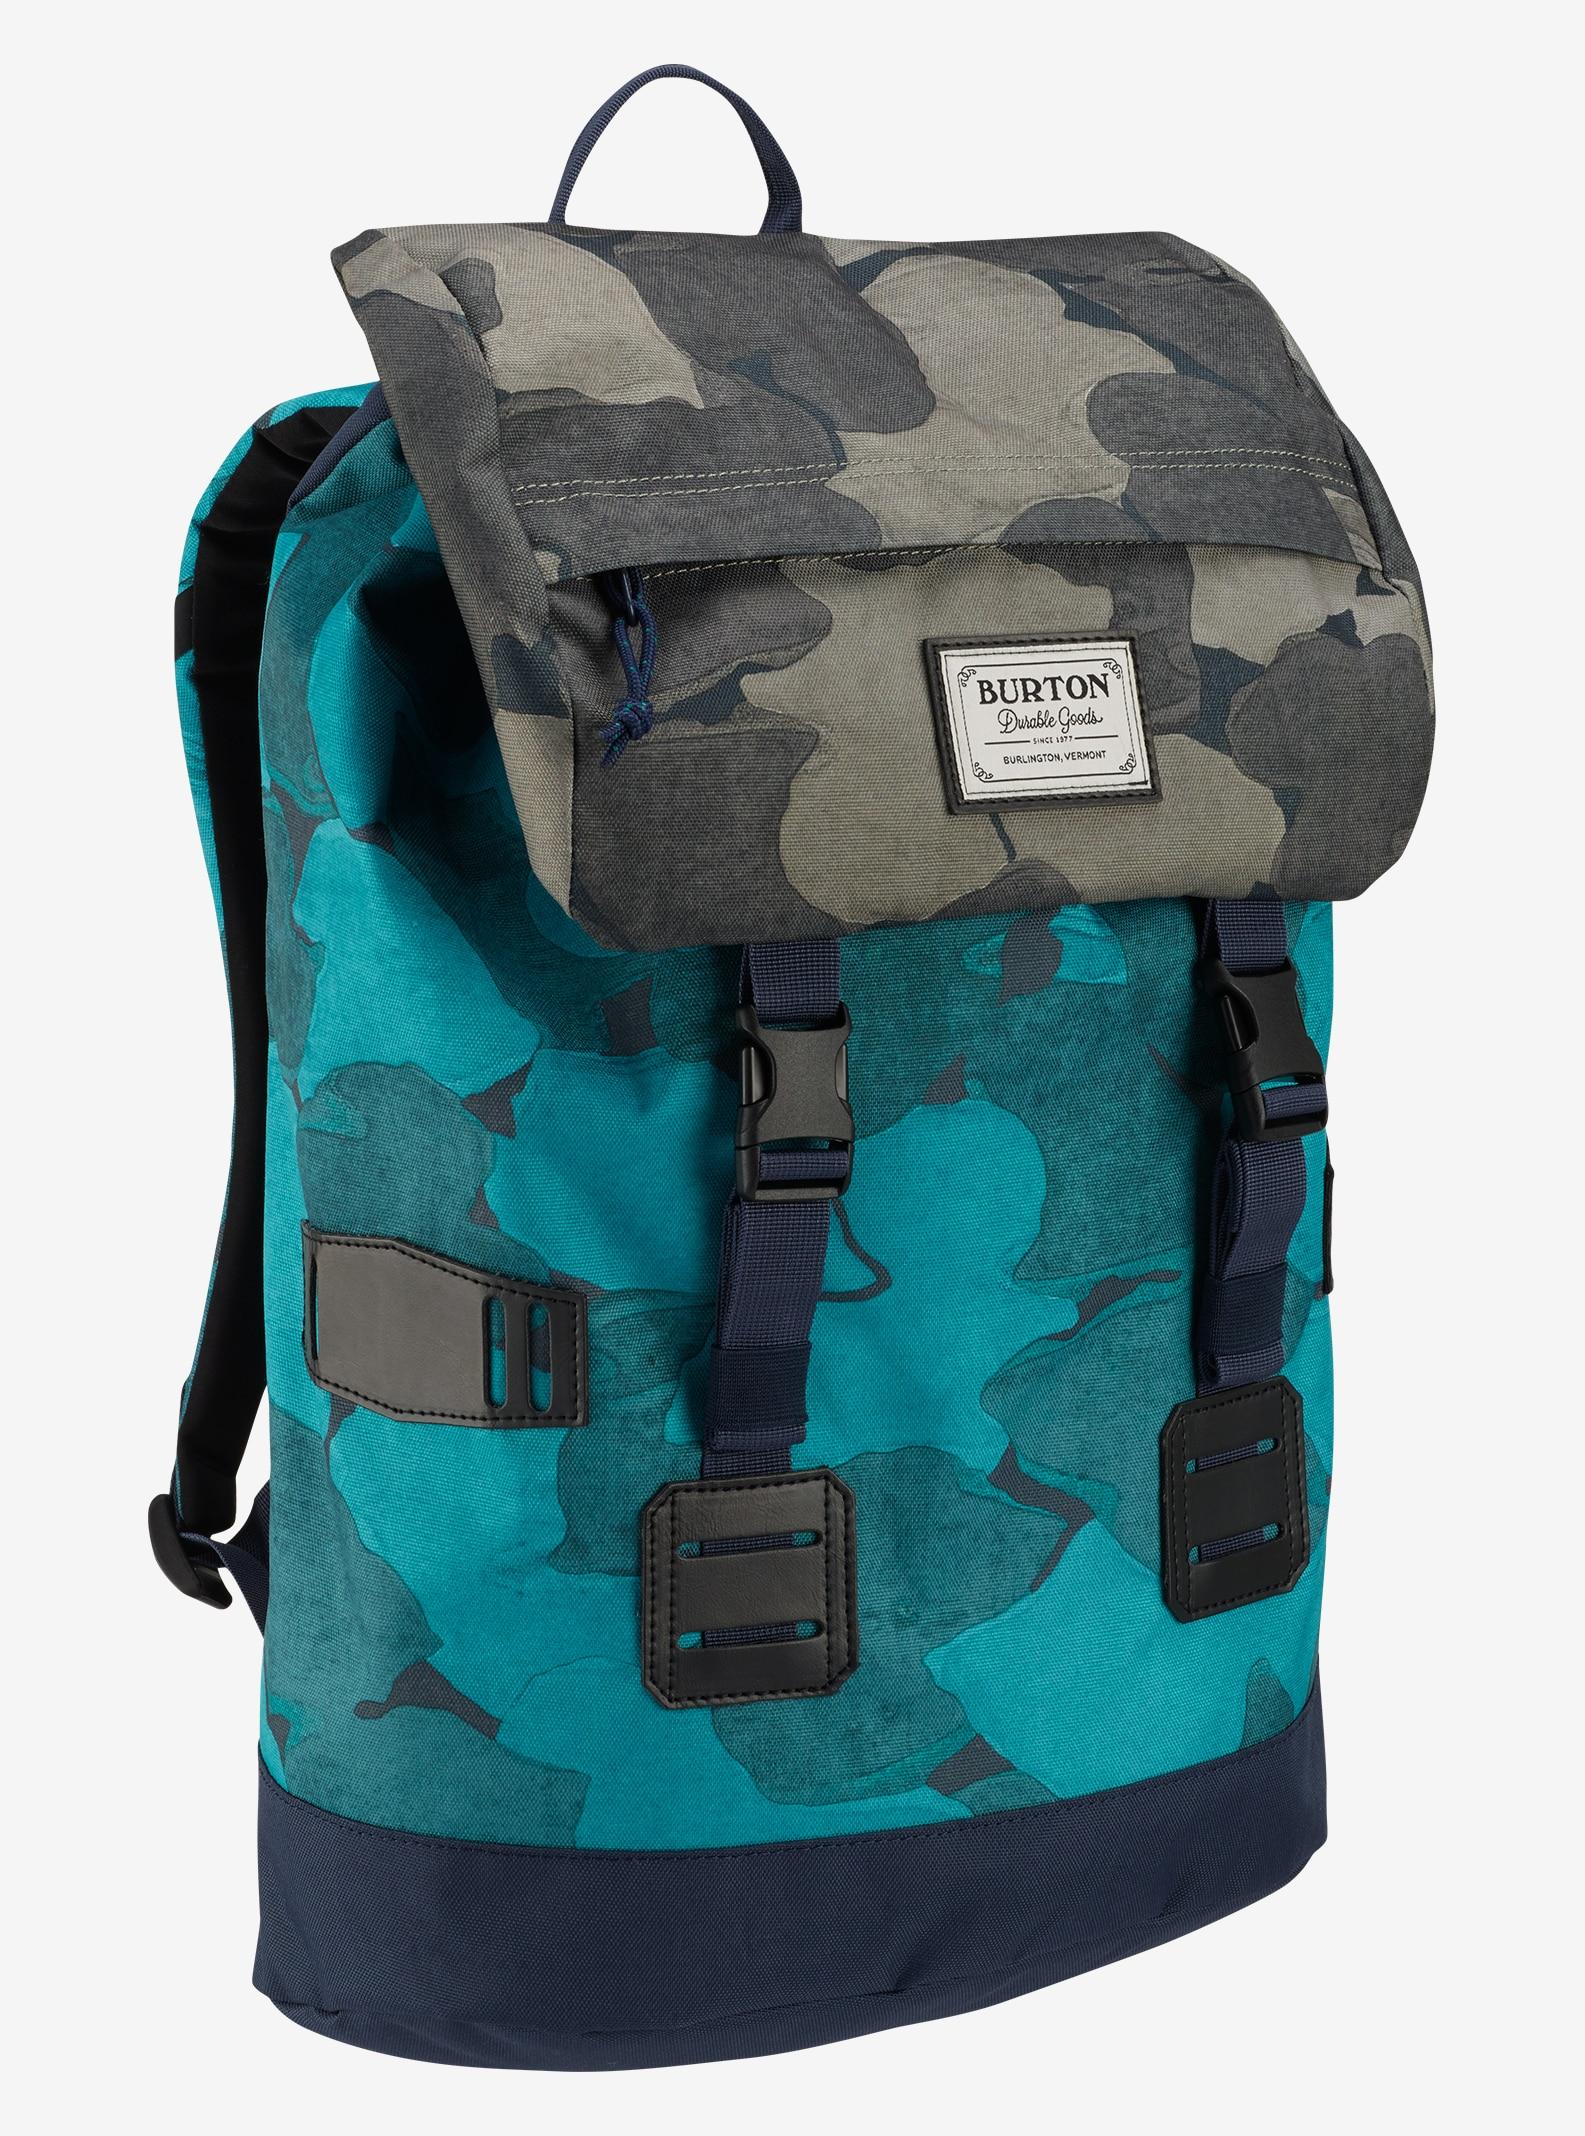 Burton Women's Tinder Backpack shown in Pond Camo Print